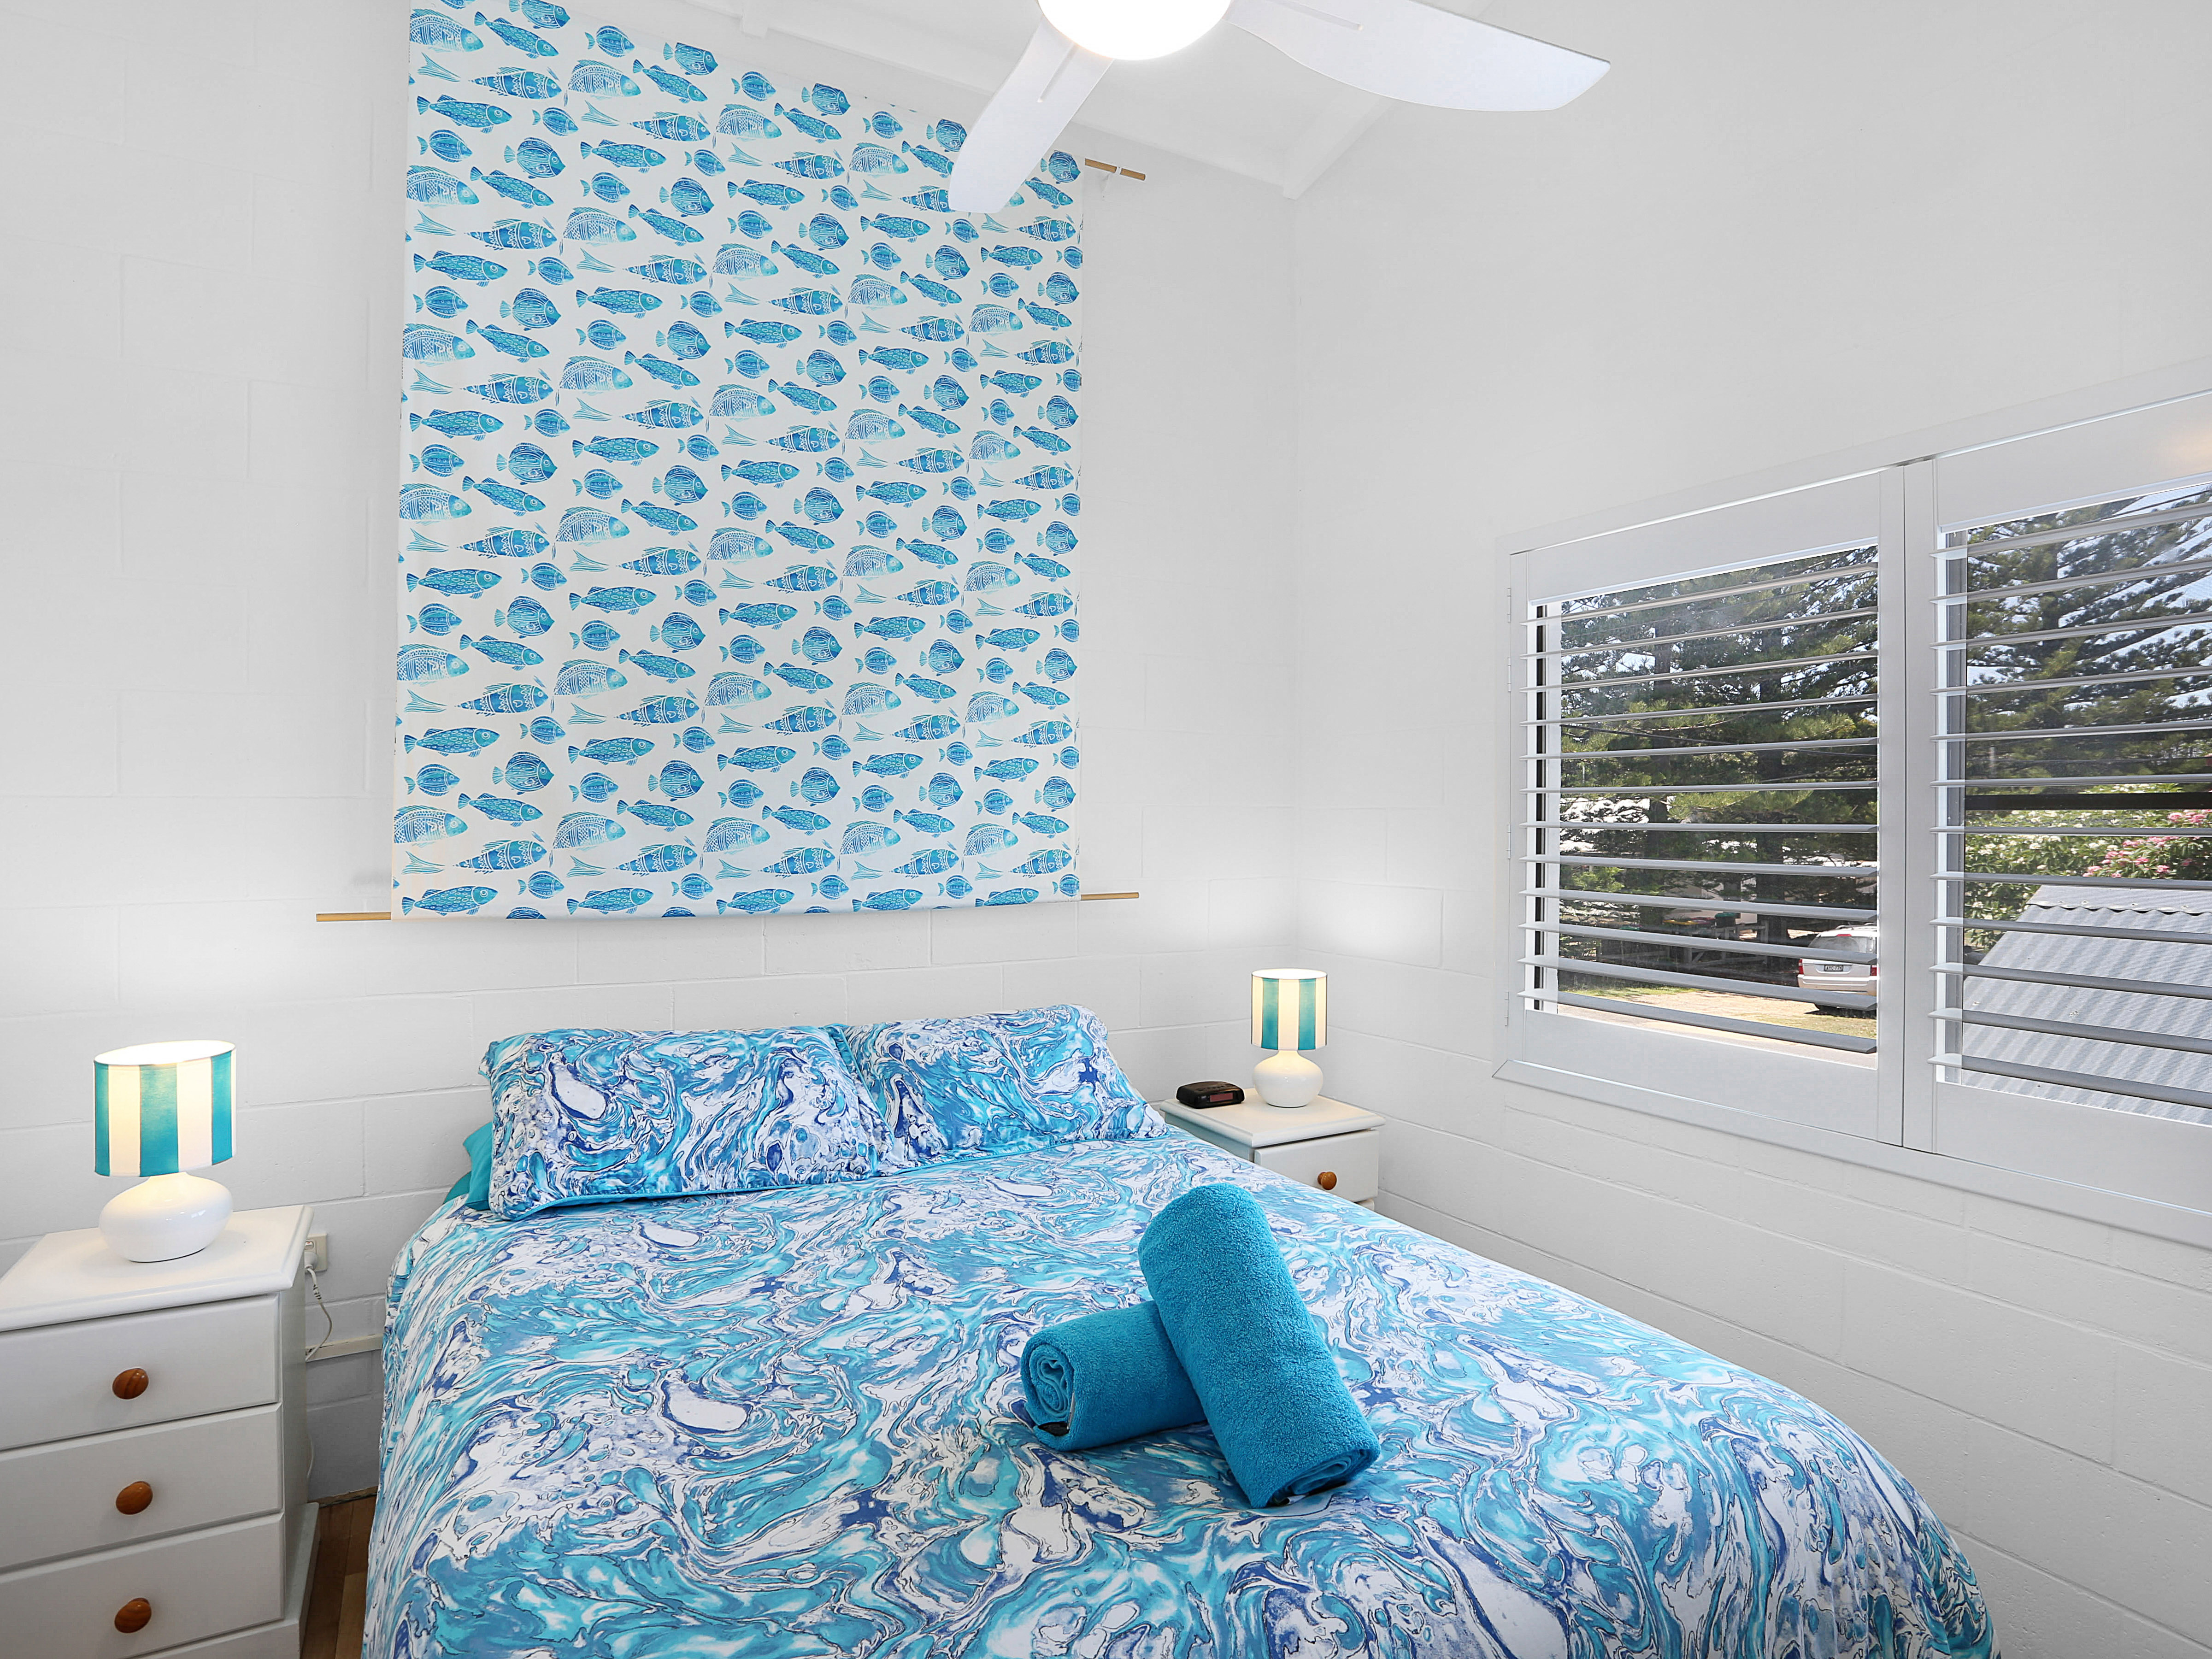 Captains Bridge master bedroom gallery image